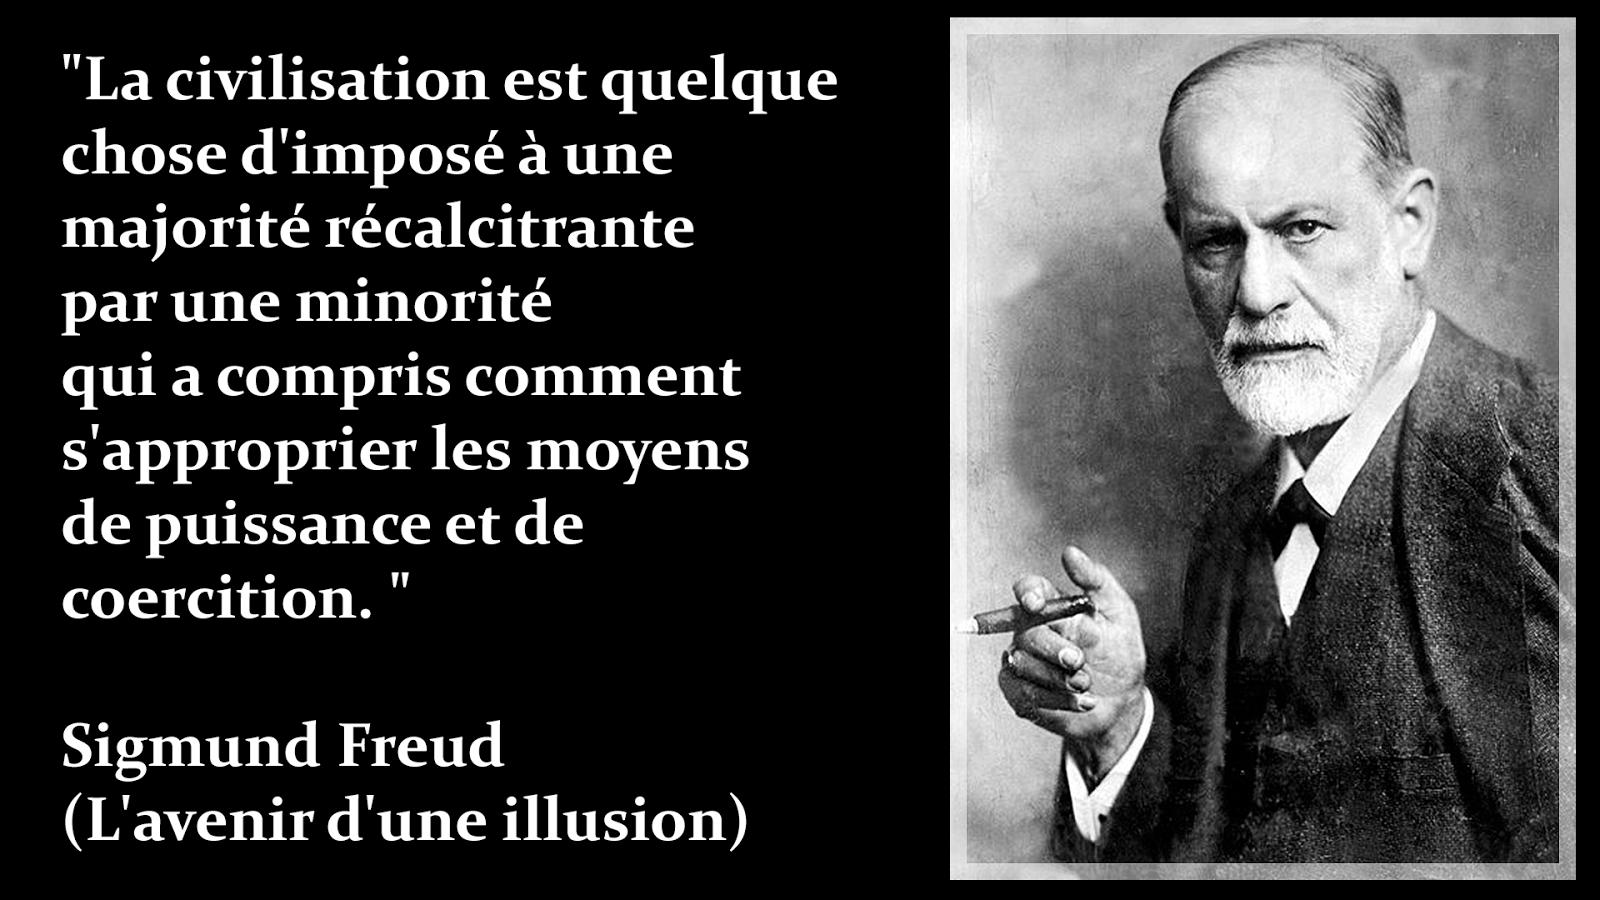 Citaten Freud : Freud citation